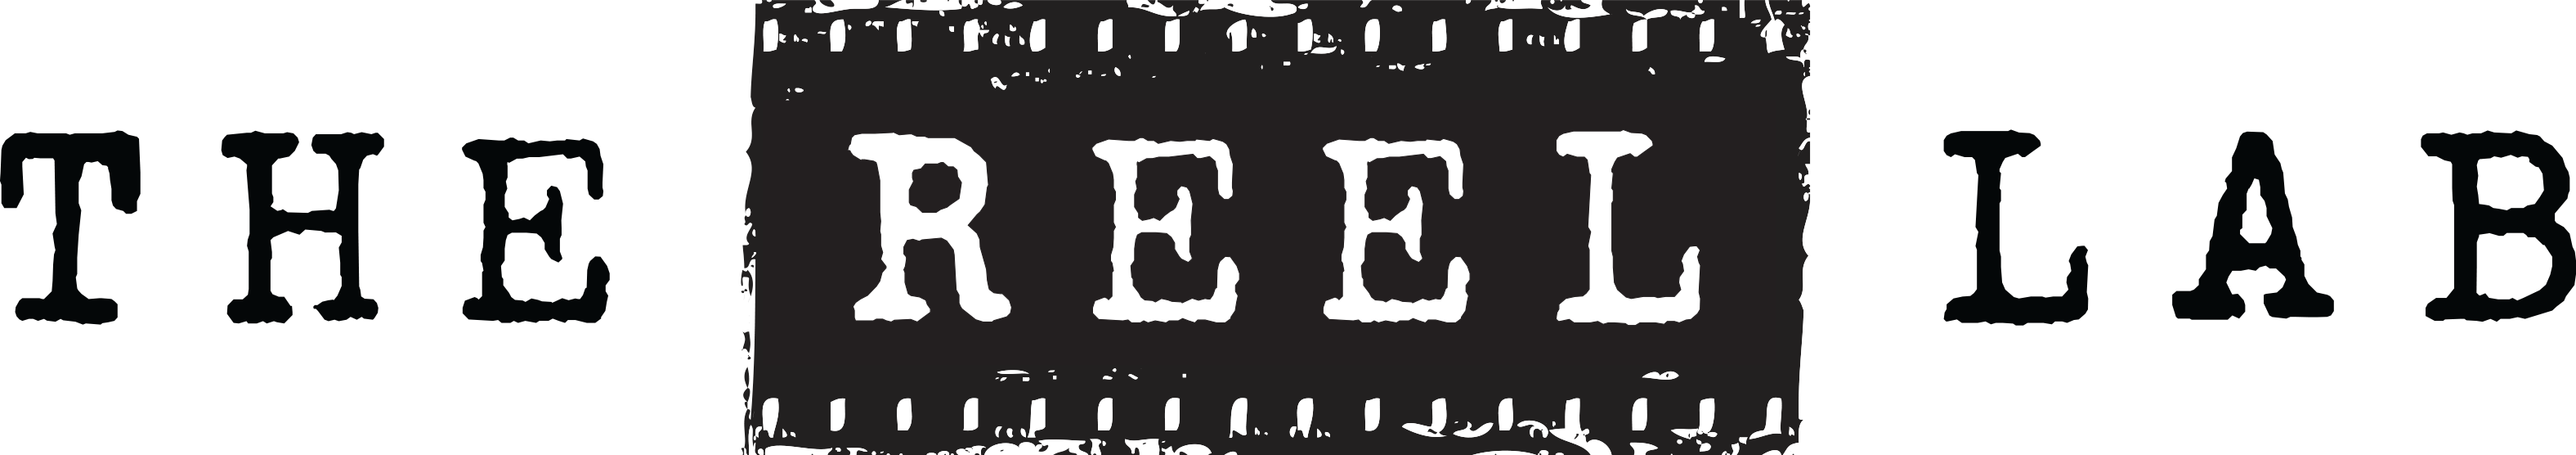 Reel Lab logo refined (dragged) copy